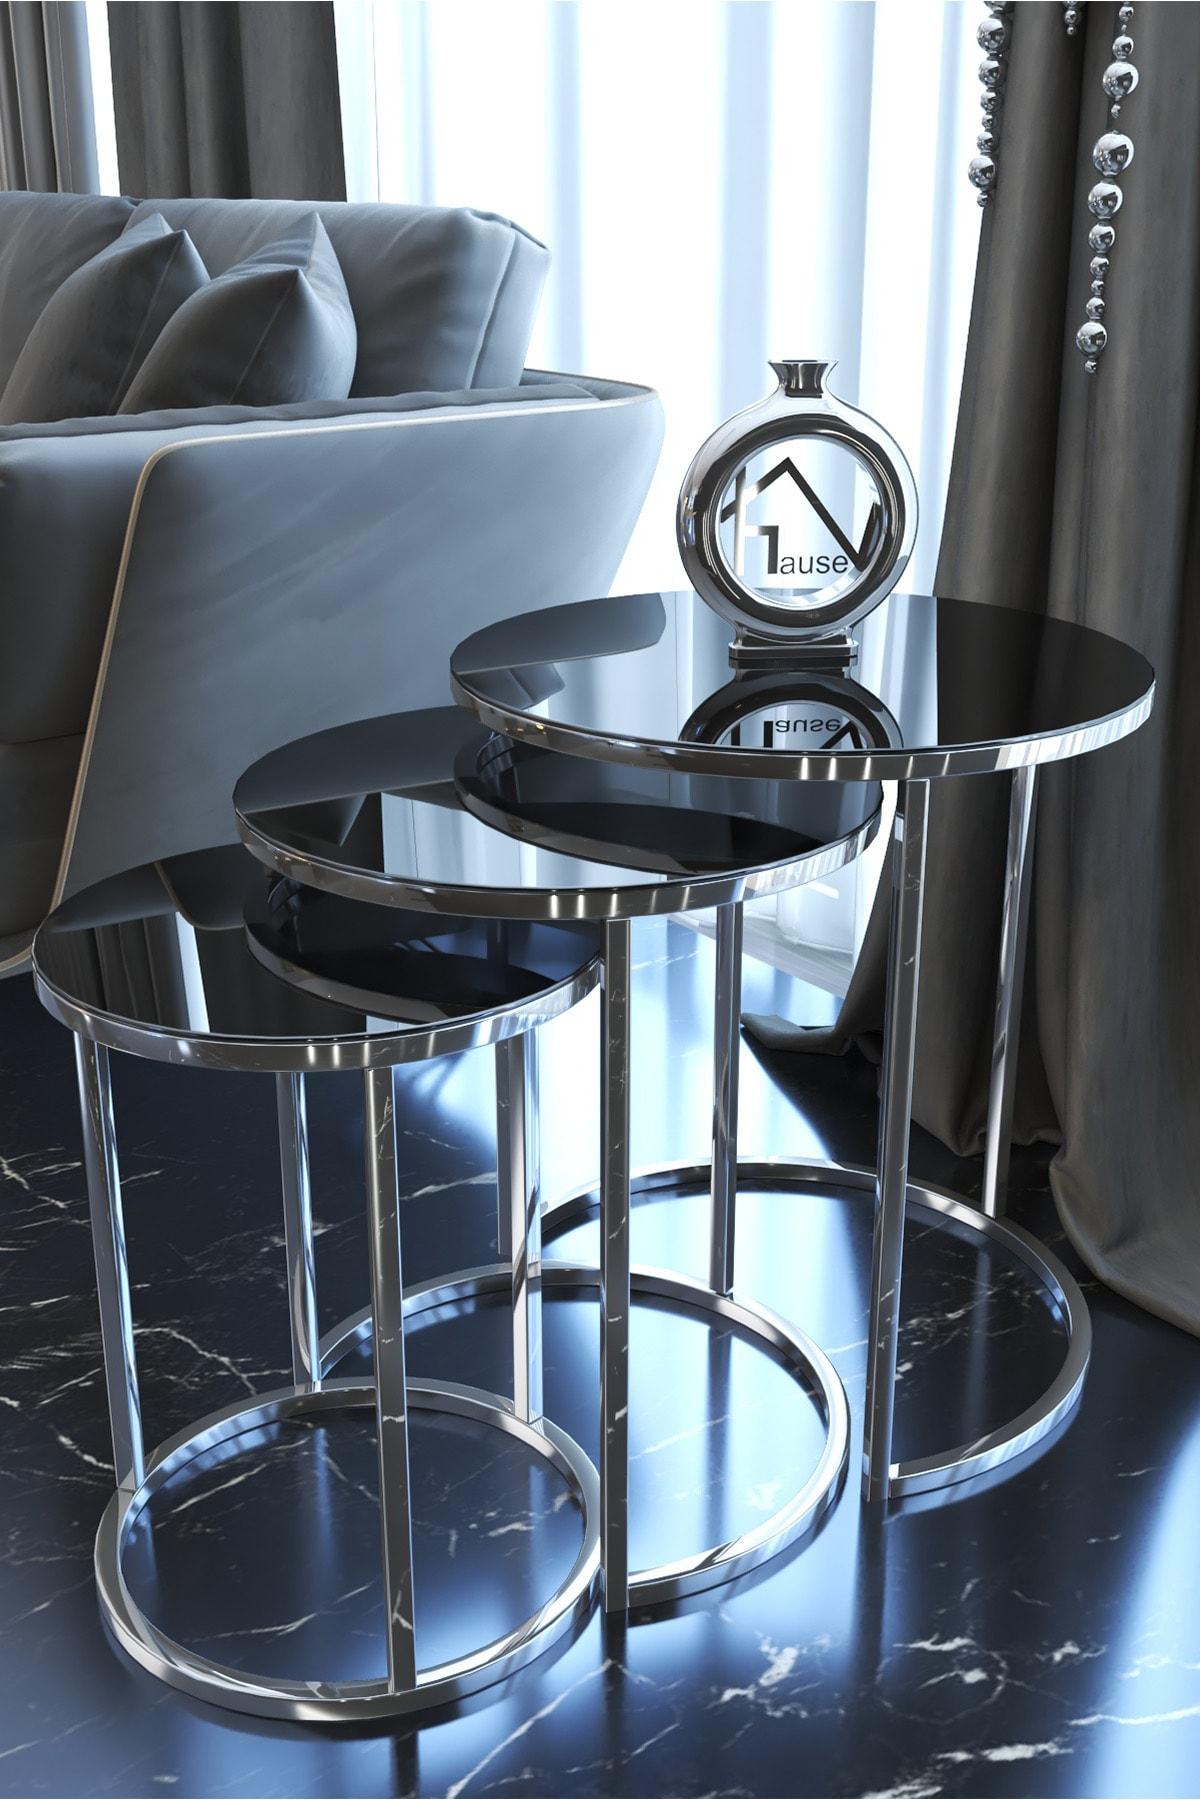 HAUSEV Aynalı Gümüş Metal Zigon Sehpa 1